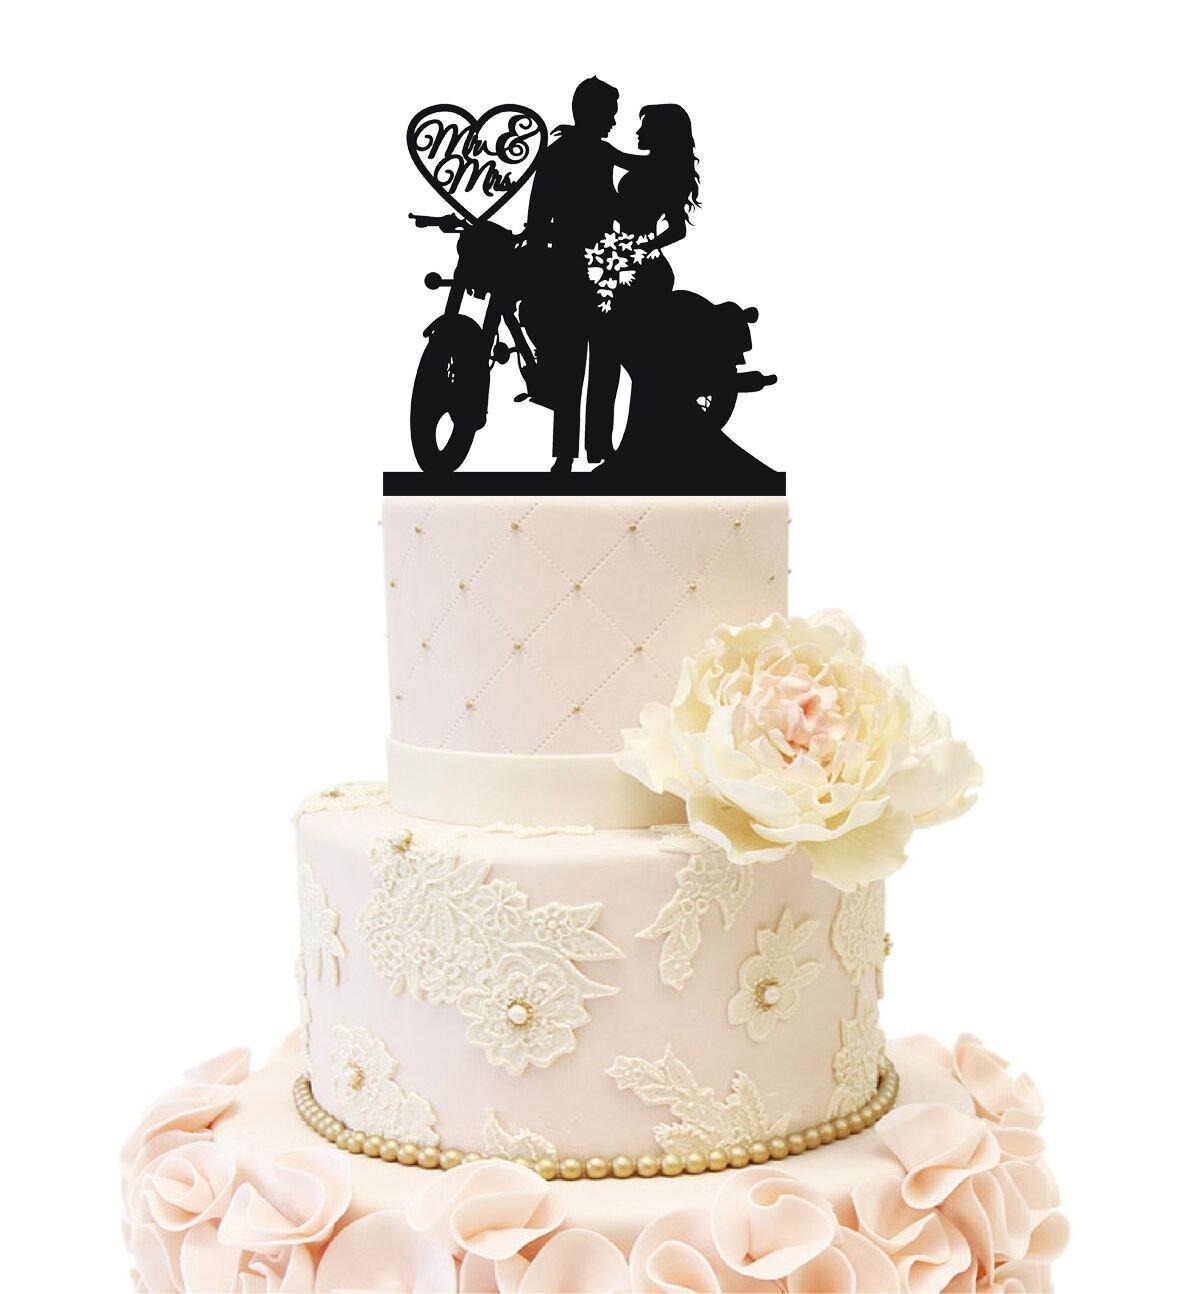 Amazon.com: Motorcycle Funny Wedding Cake Topper Mr Mrs Bride Groom ...